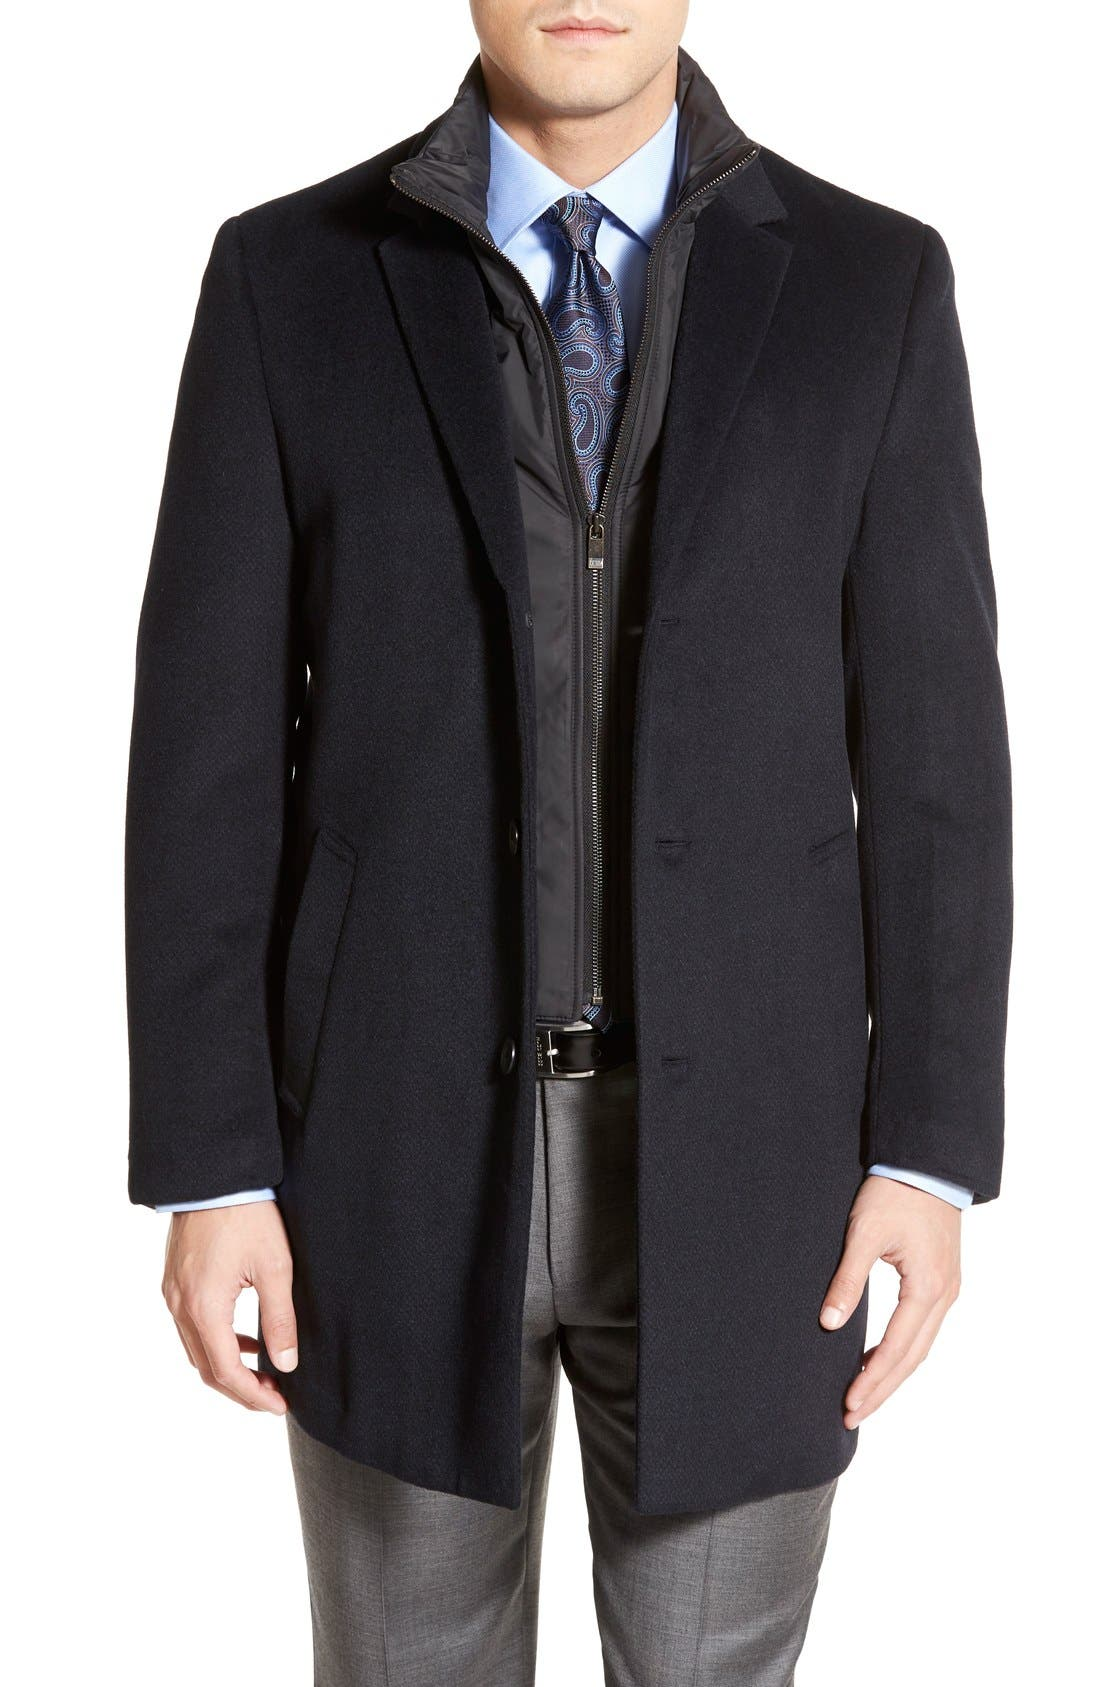 Hart Schaffner Marx 'Kingman' Classic Fit Wool Blend Coat with Removable Zipper Bib